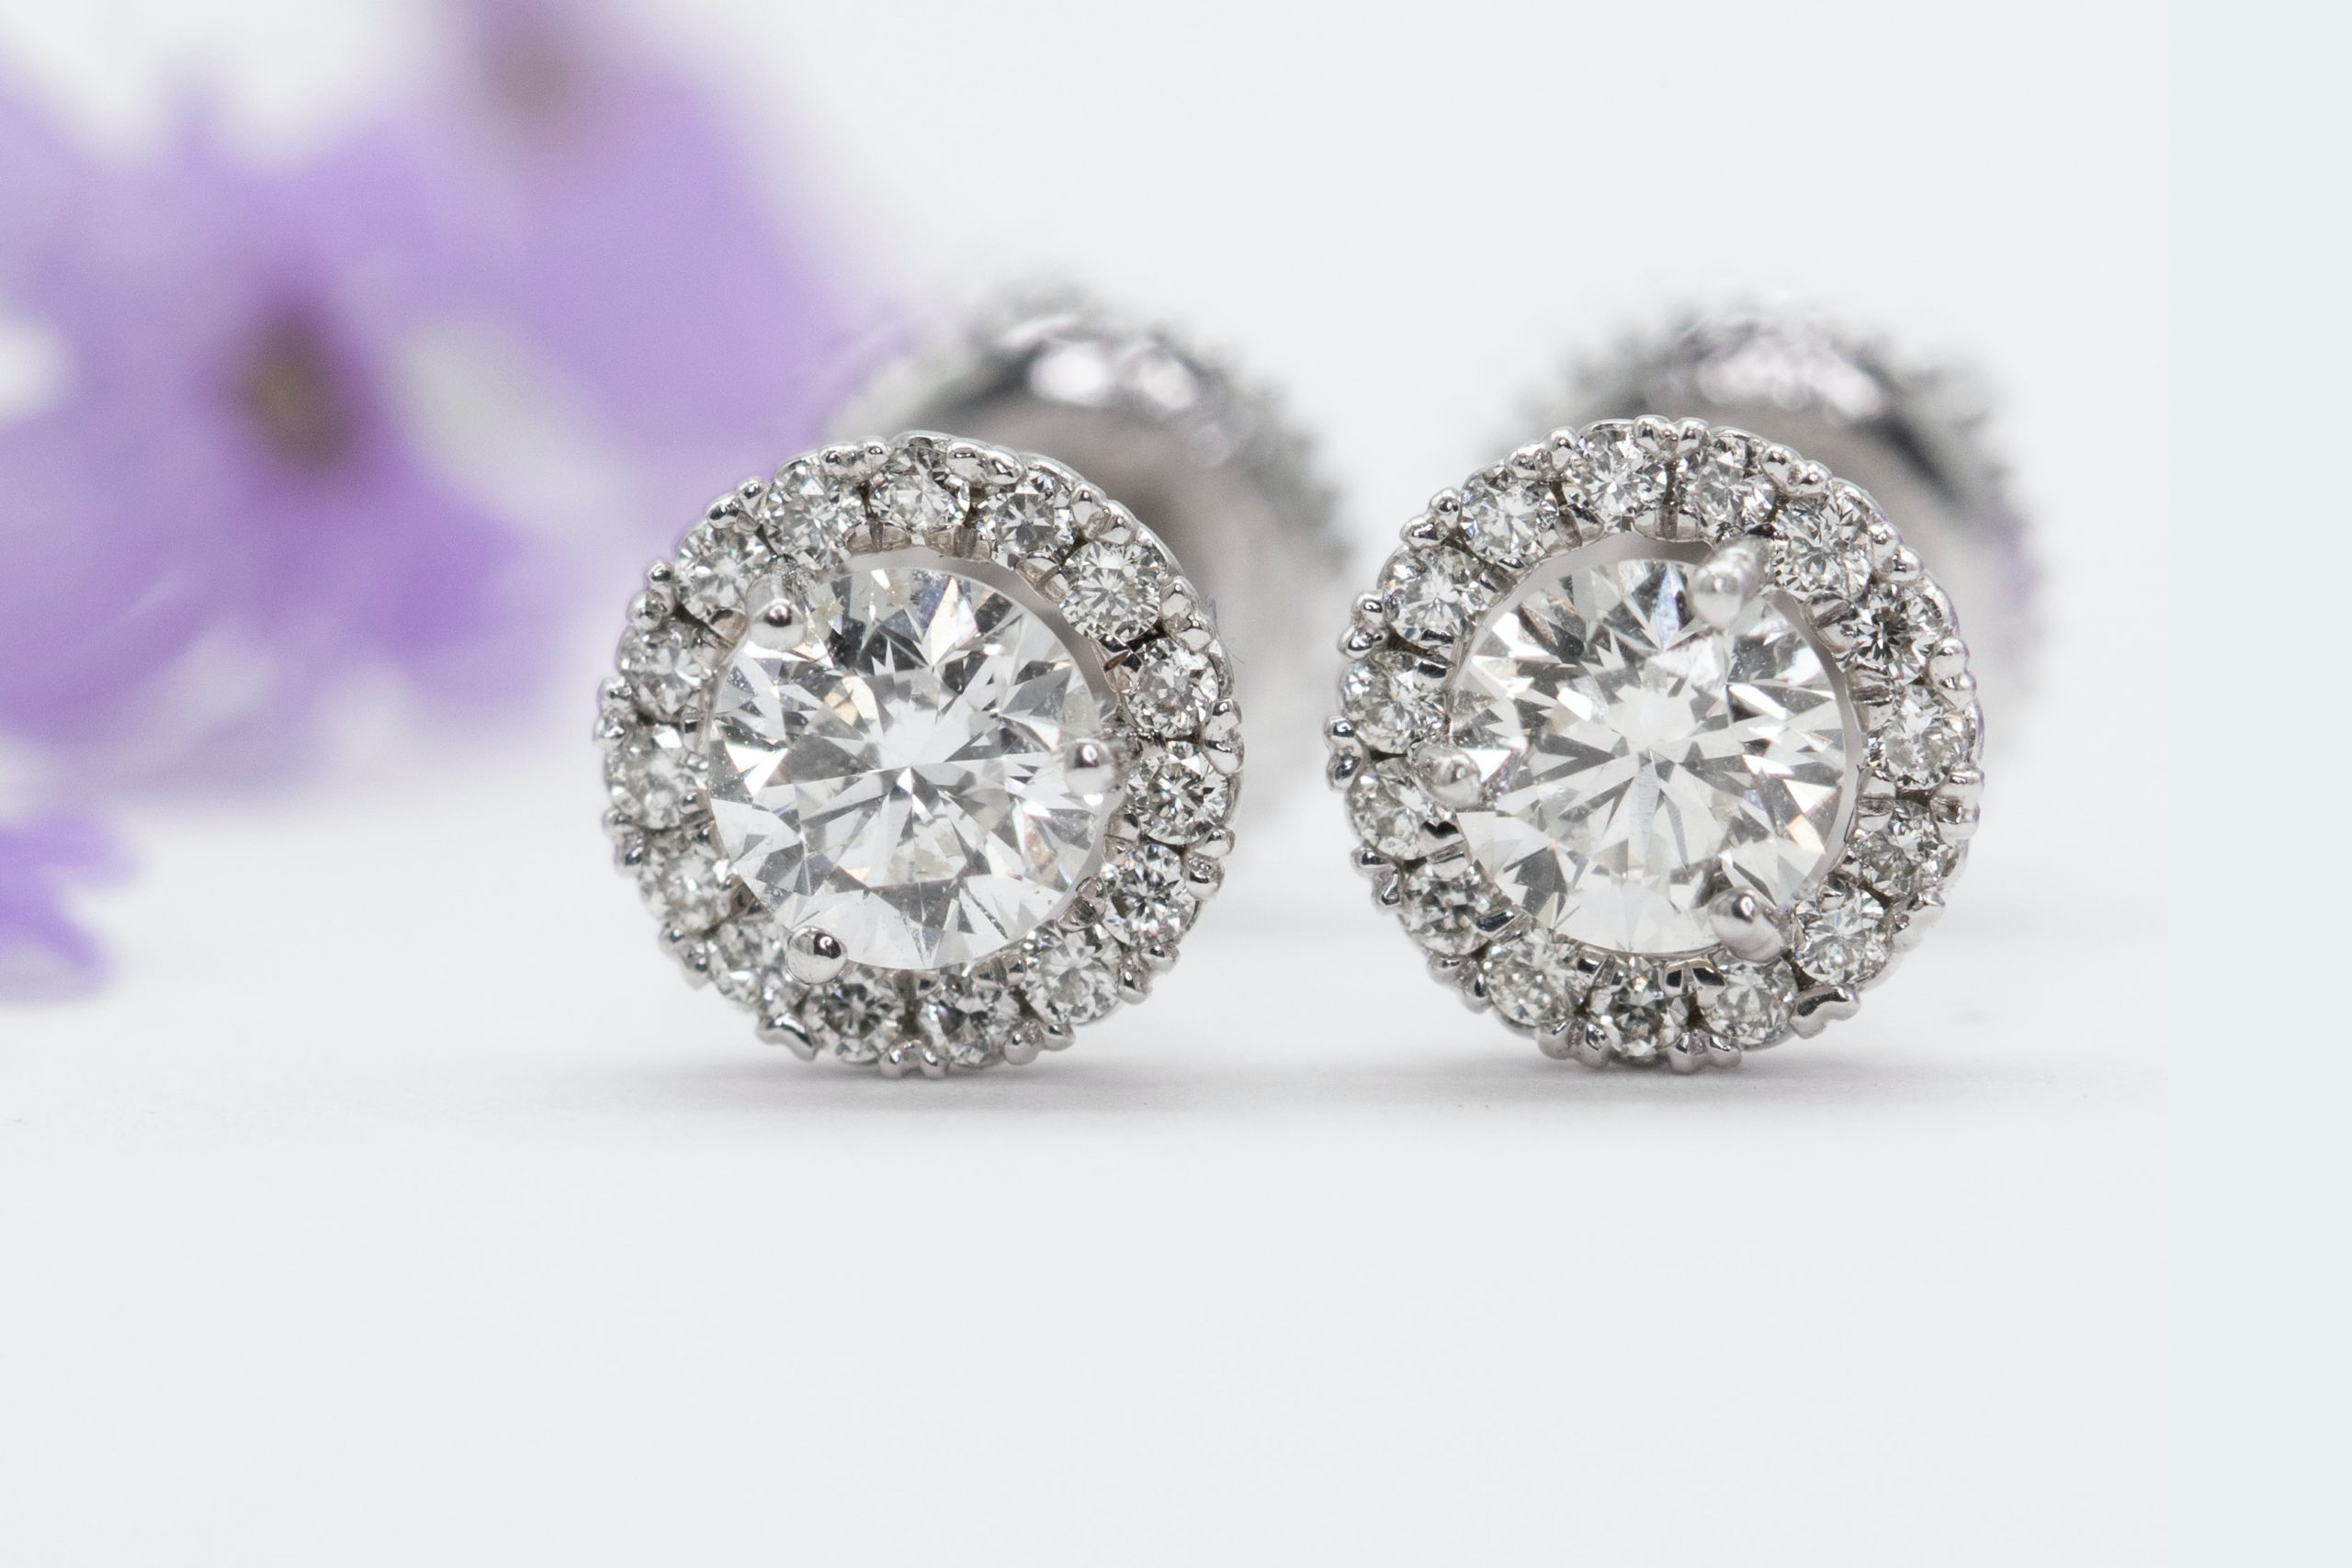 Diamond Earrings In Atlanta, GA